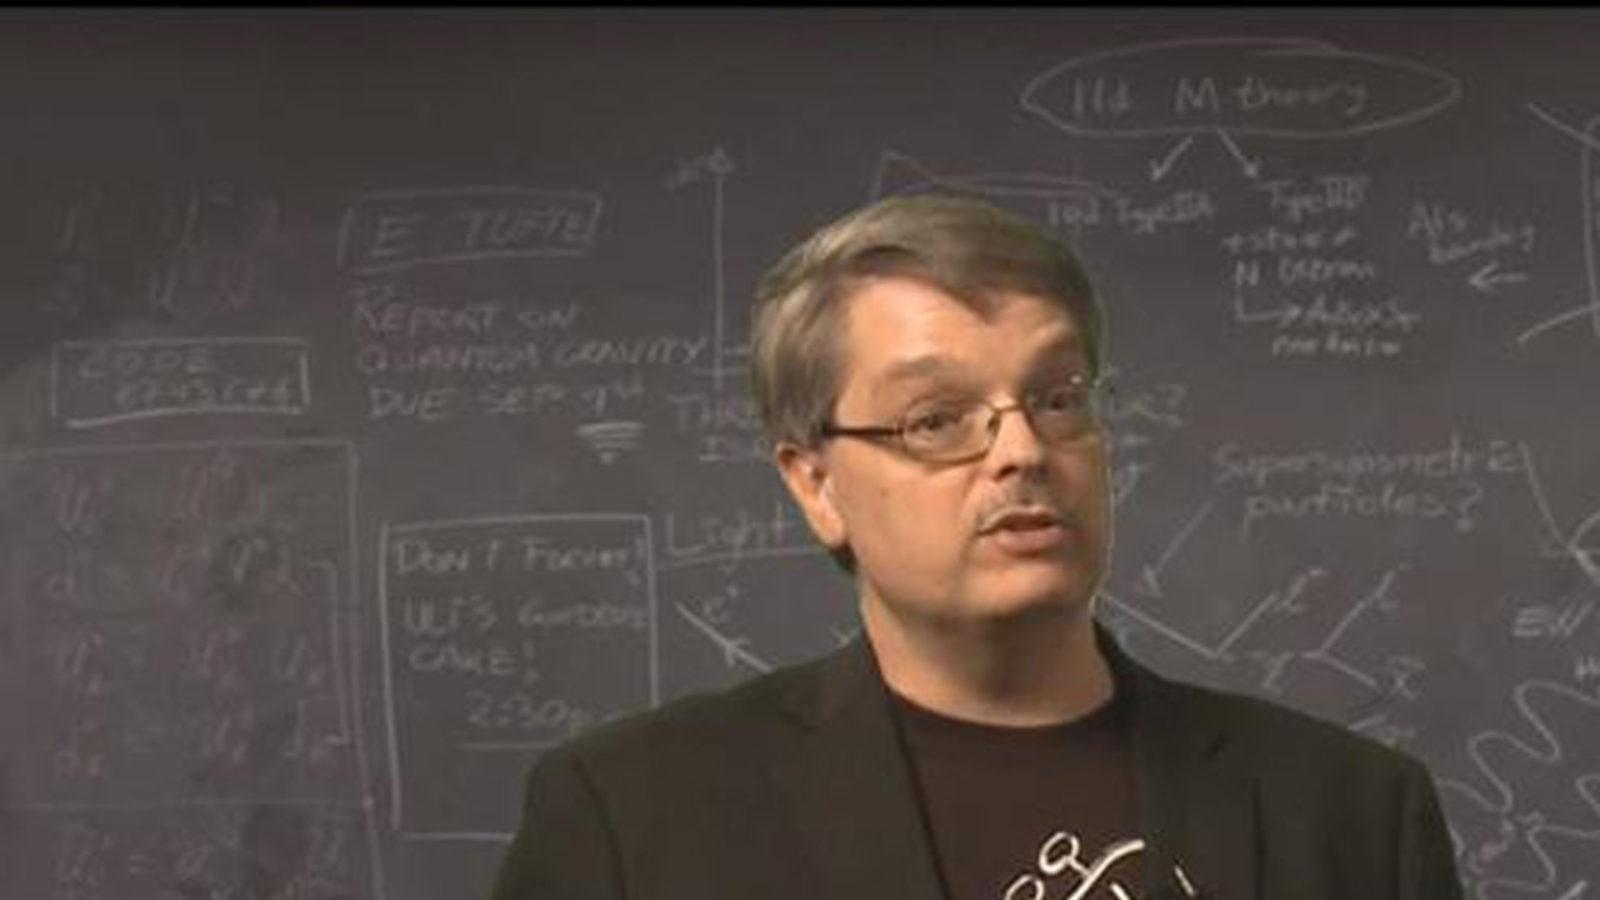 Photo: Standard Model video